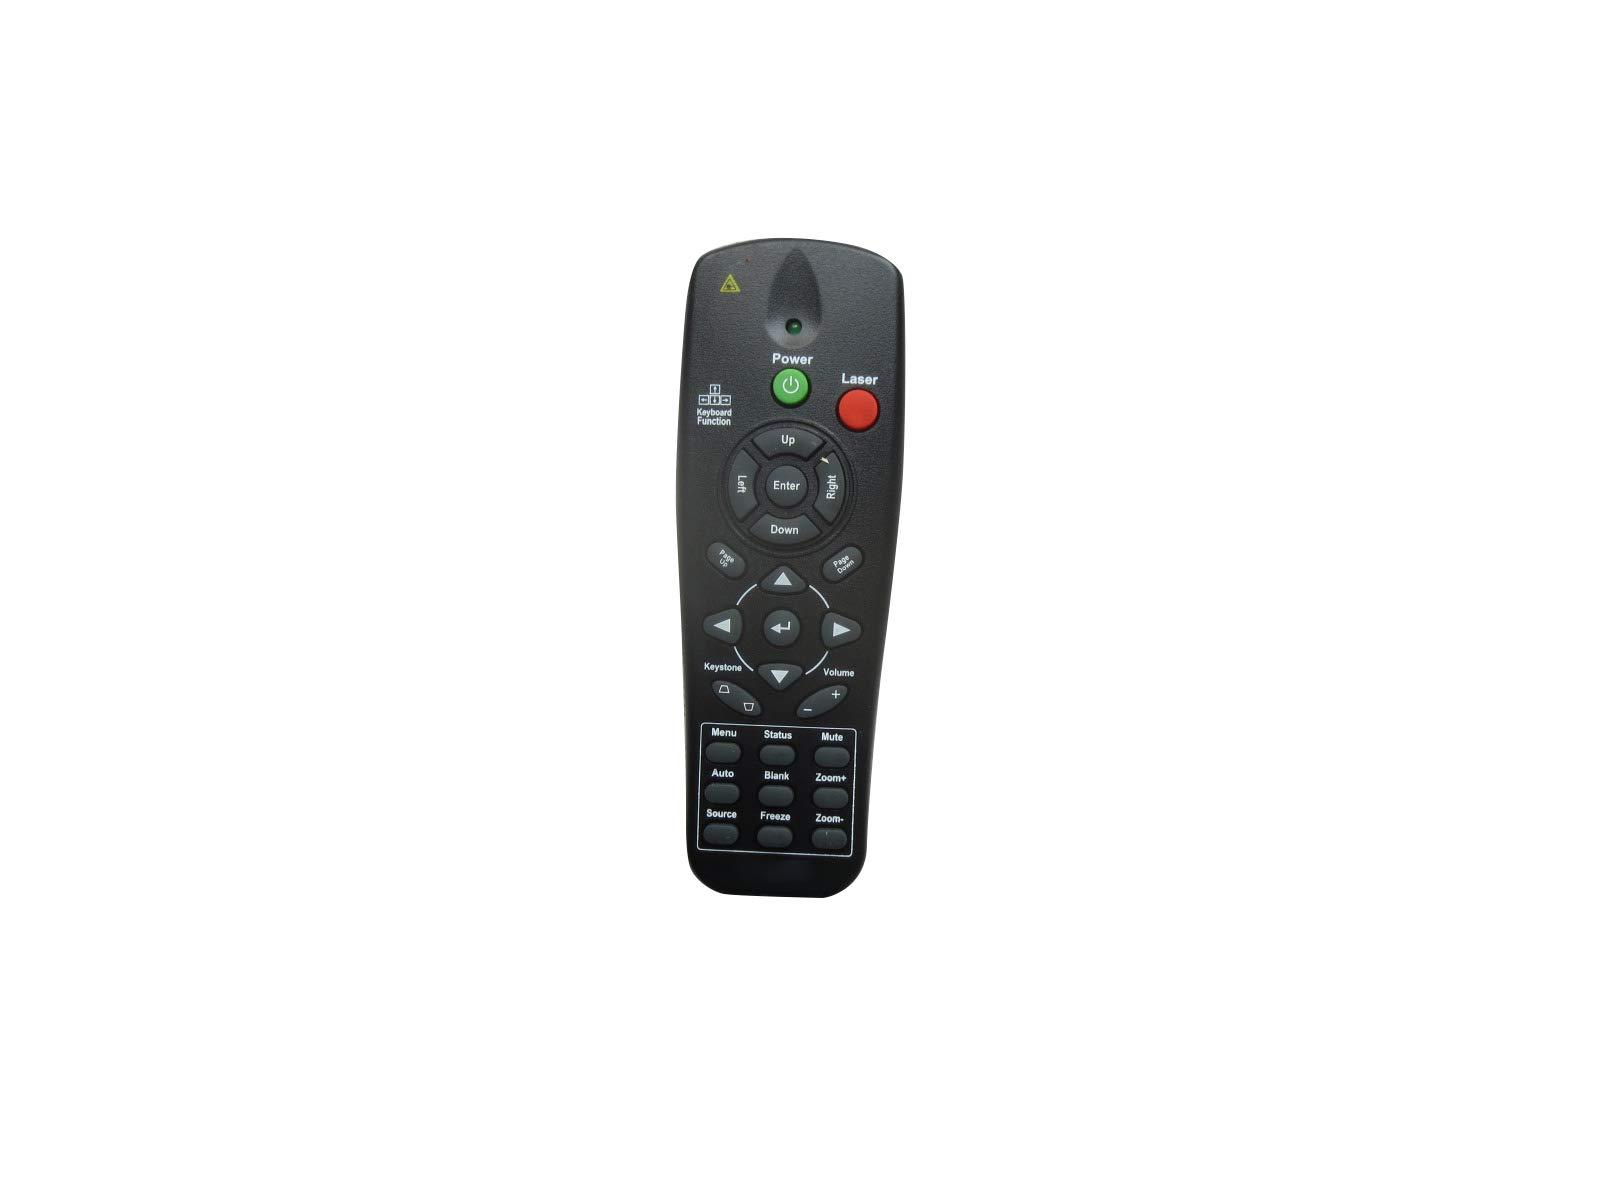 Remote Control for Promethean SSIHD-P1 PRM-45 PRM-45A PRM-42 PRM-42A PRM-32 UST-P1 PRM-35 UST-P1G DLP Projector by Easytry123